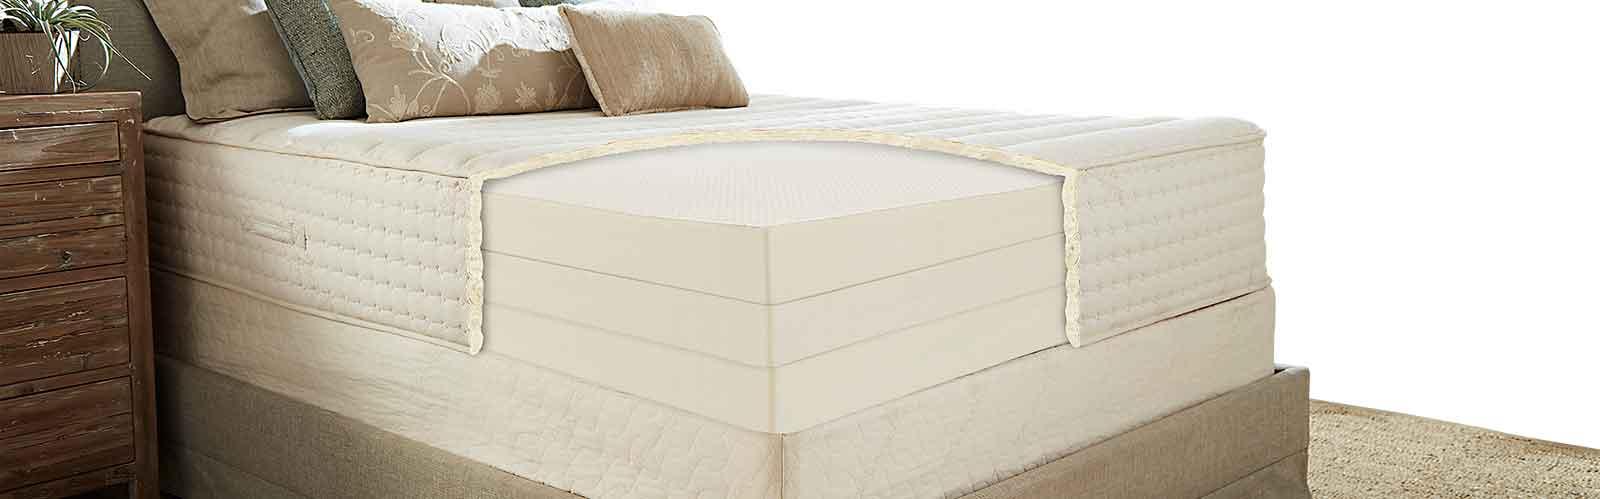 beautiful mattress sleep plush independent alwyn of amp topper elegant foam memory reviews new quot home